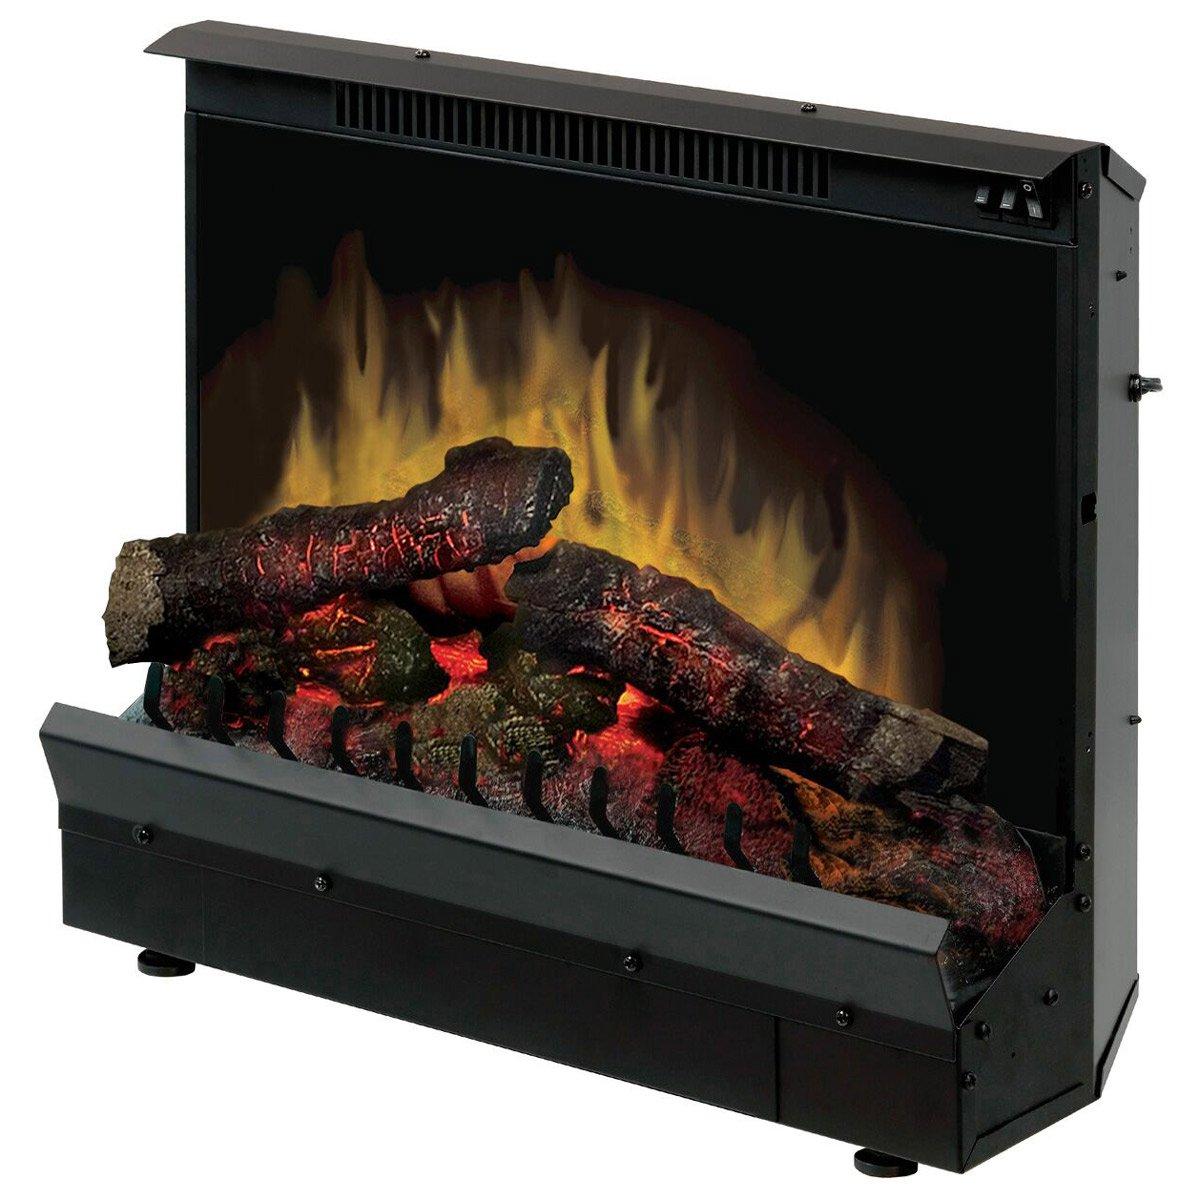 Dimplex DFI2310 Efficient Deluxe Heat 23 Inch Log Set Electric Fireplace Insert